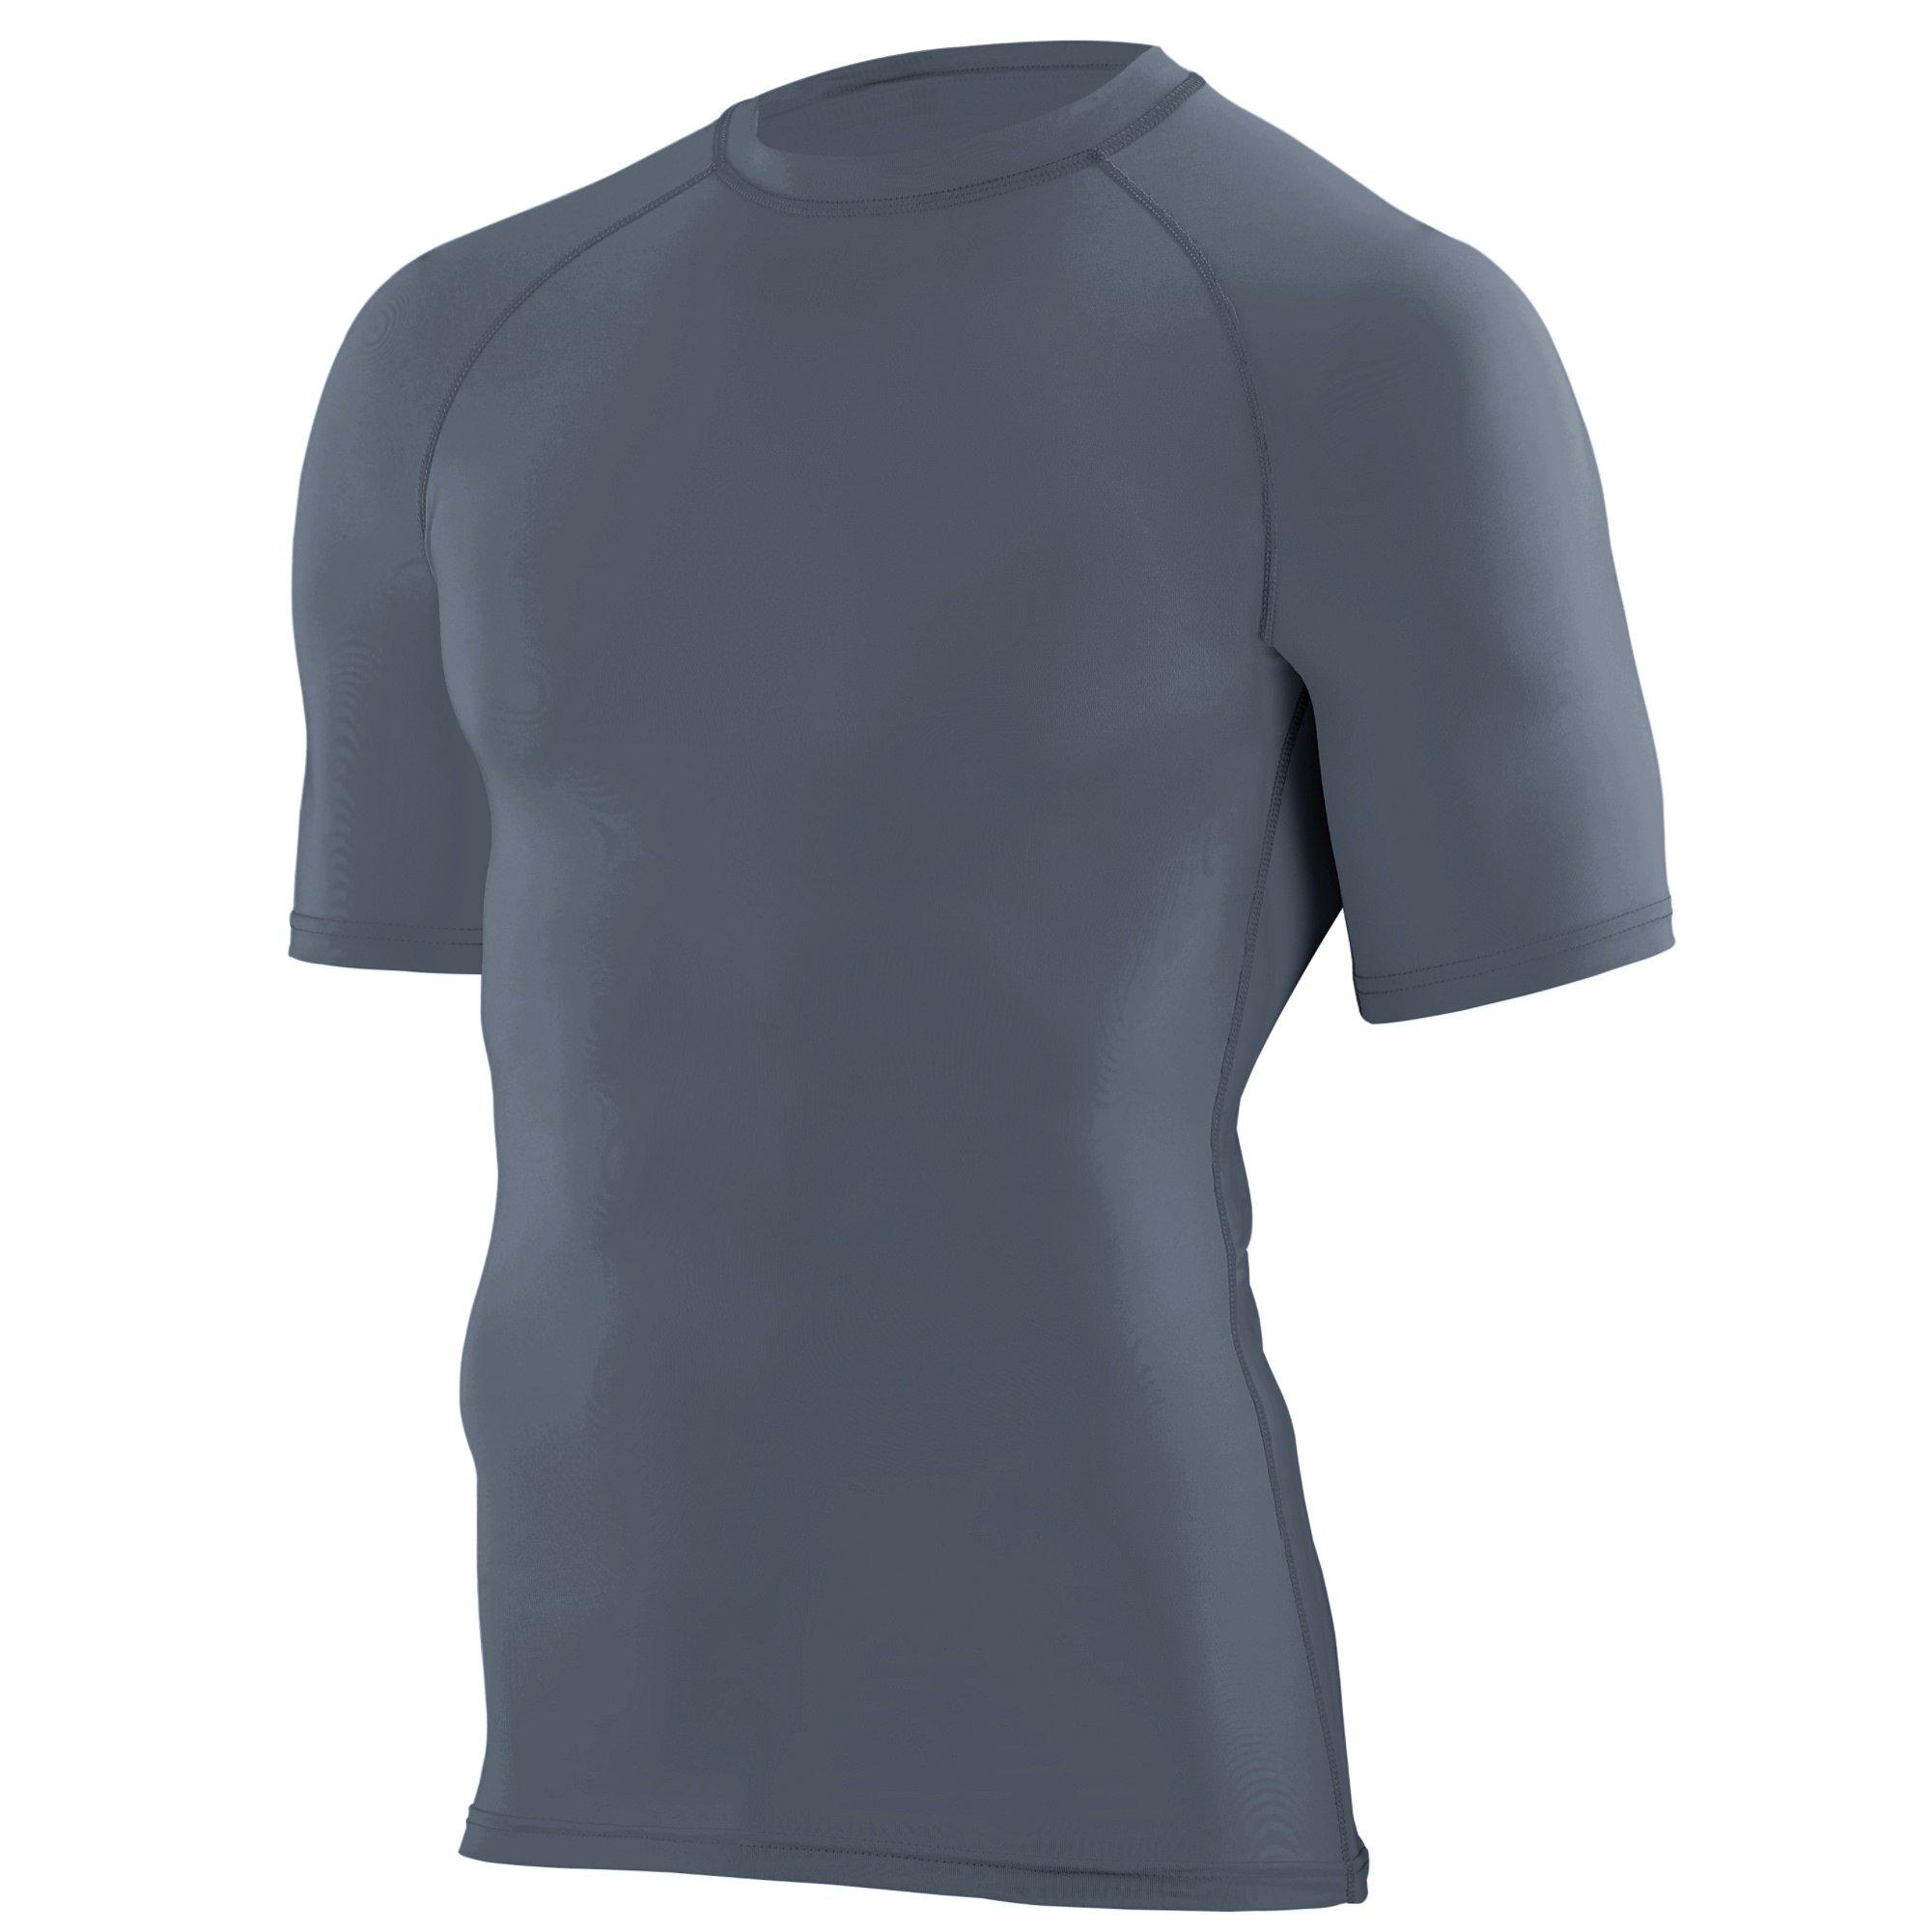 Augusta Sportswear Boys' Hyperform Compression Short Sleeve Shirt S Graphite